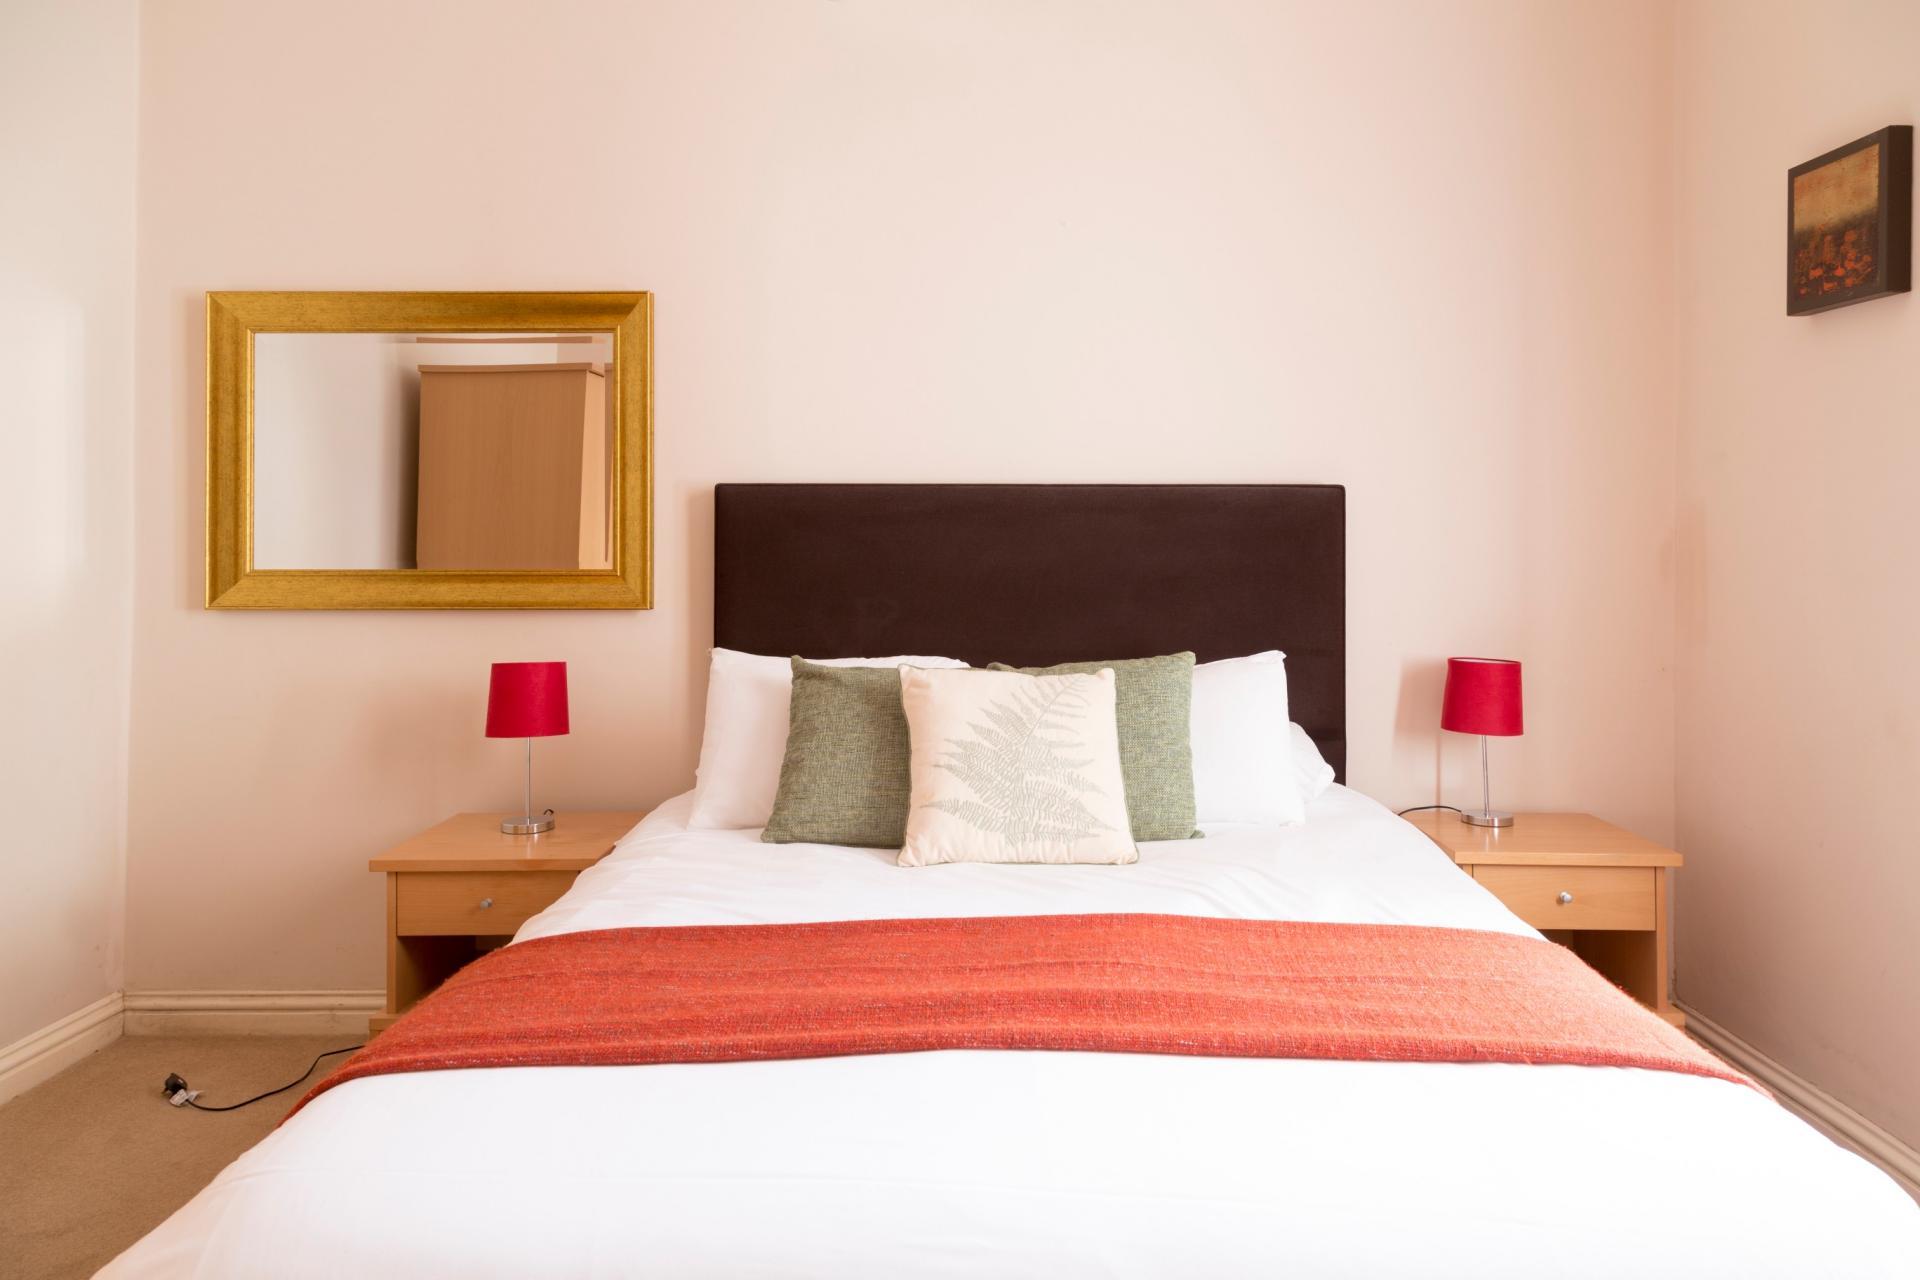 Bedding at Norwich Street Cambridge Apartments - Citybase Apartments